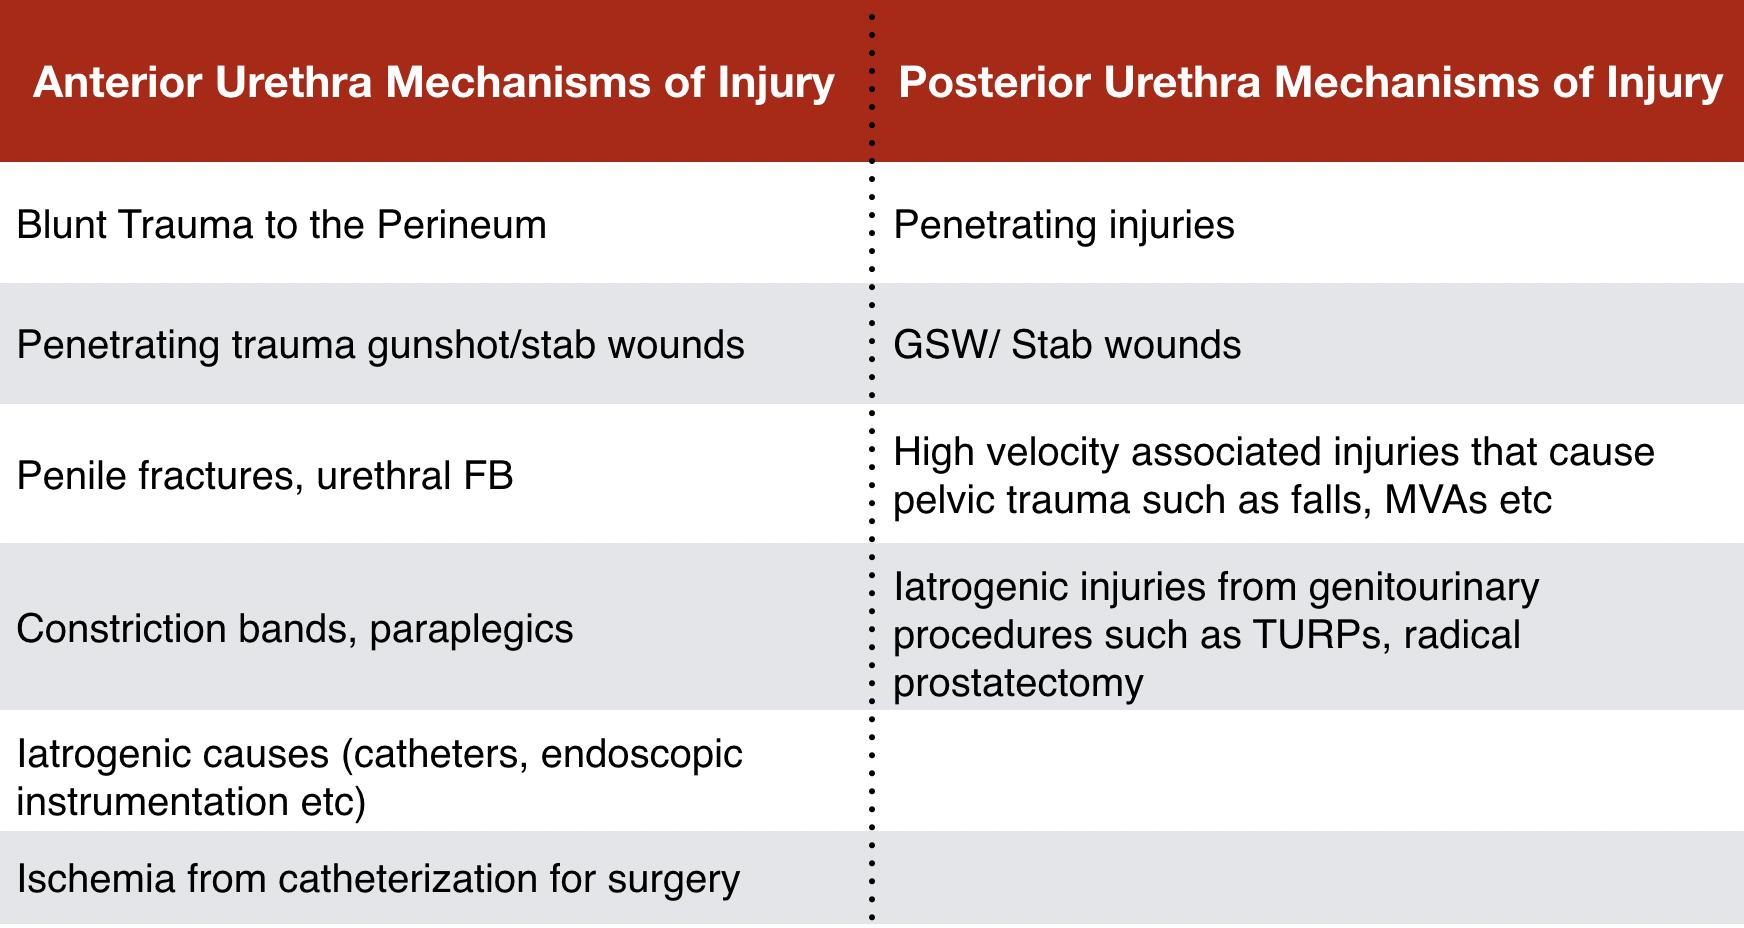 Table 1 - Common Mechanisms of Injury in Urethral Trauma. Chapple C, Barbagli G, Jordan G. Consensus statement on urethral trauma. BJU Int. 2004; 93(9):1195–20